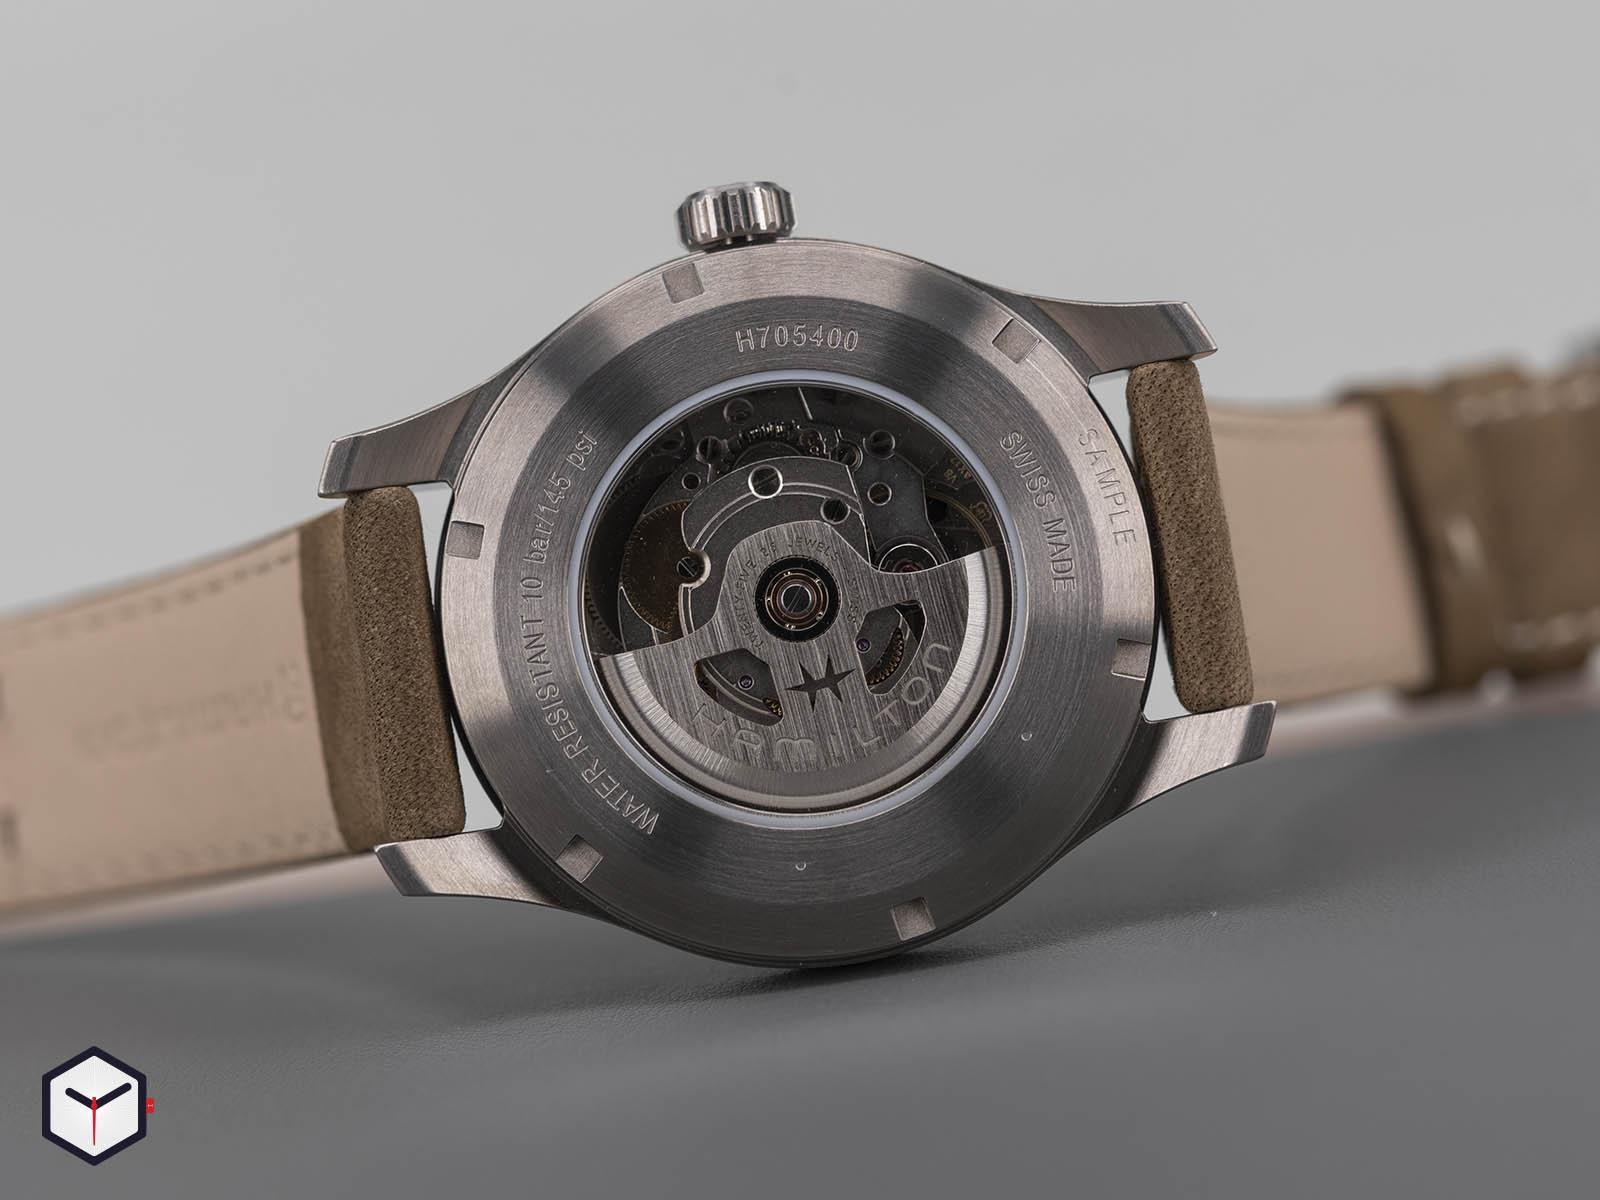 h70545550-hamilton-khaki-field-titanium-auto-5.jpg